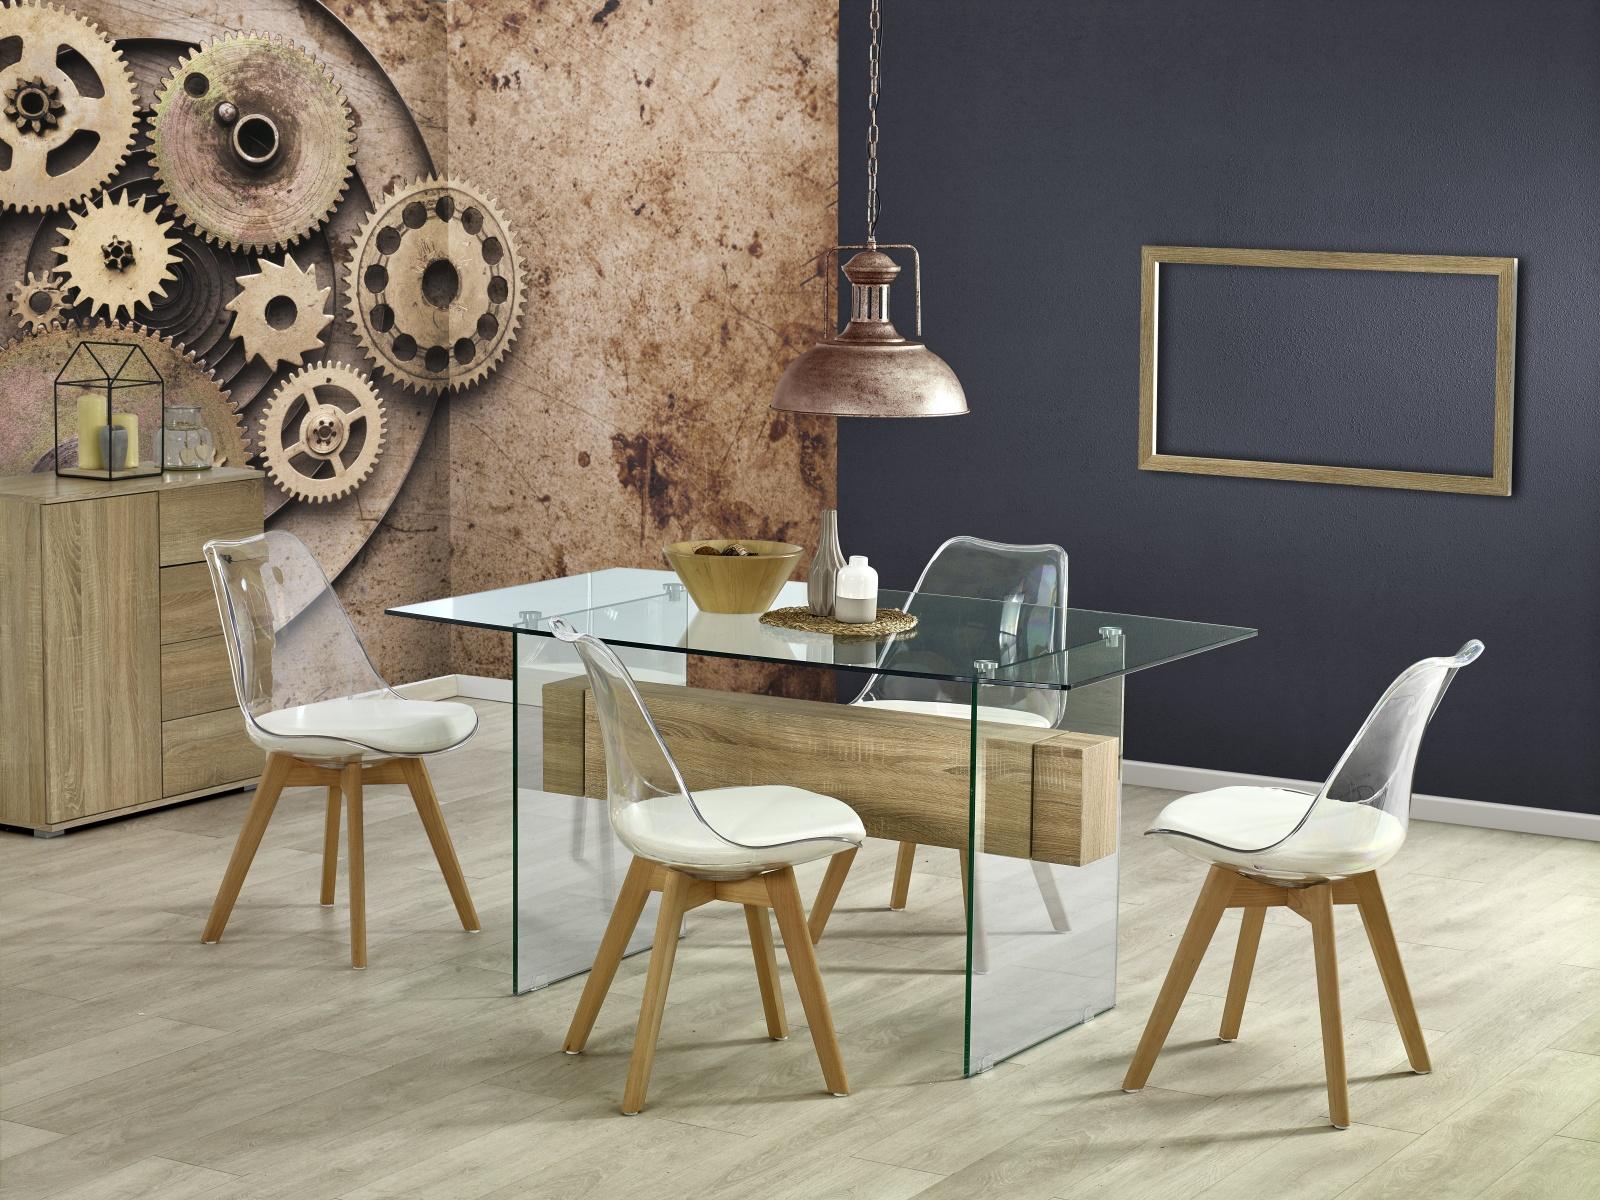 Halmar Jídelní stůl BERGEN 150x90 cm, dub sonoma